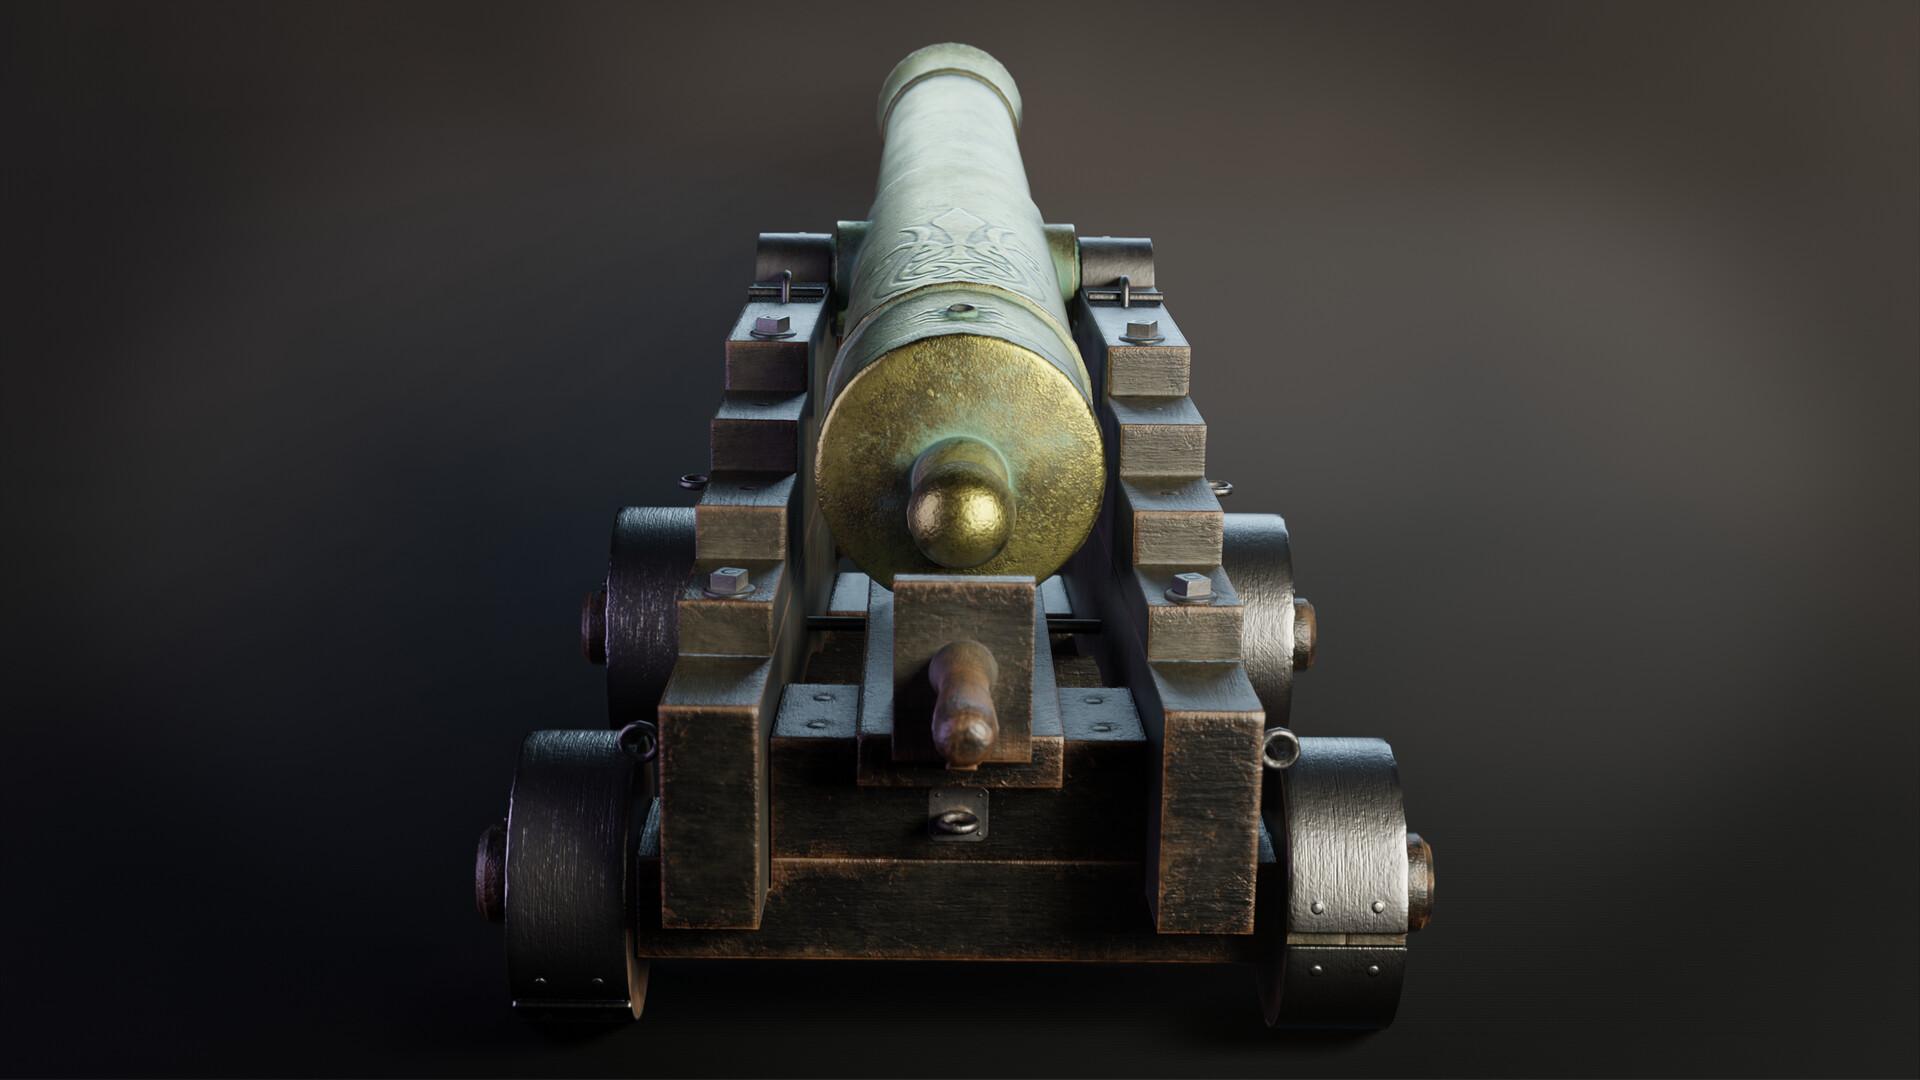 Pavel mazanik naval cannon render 04